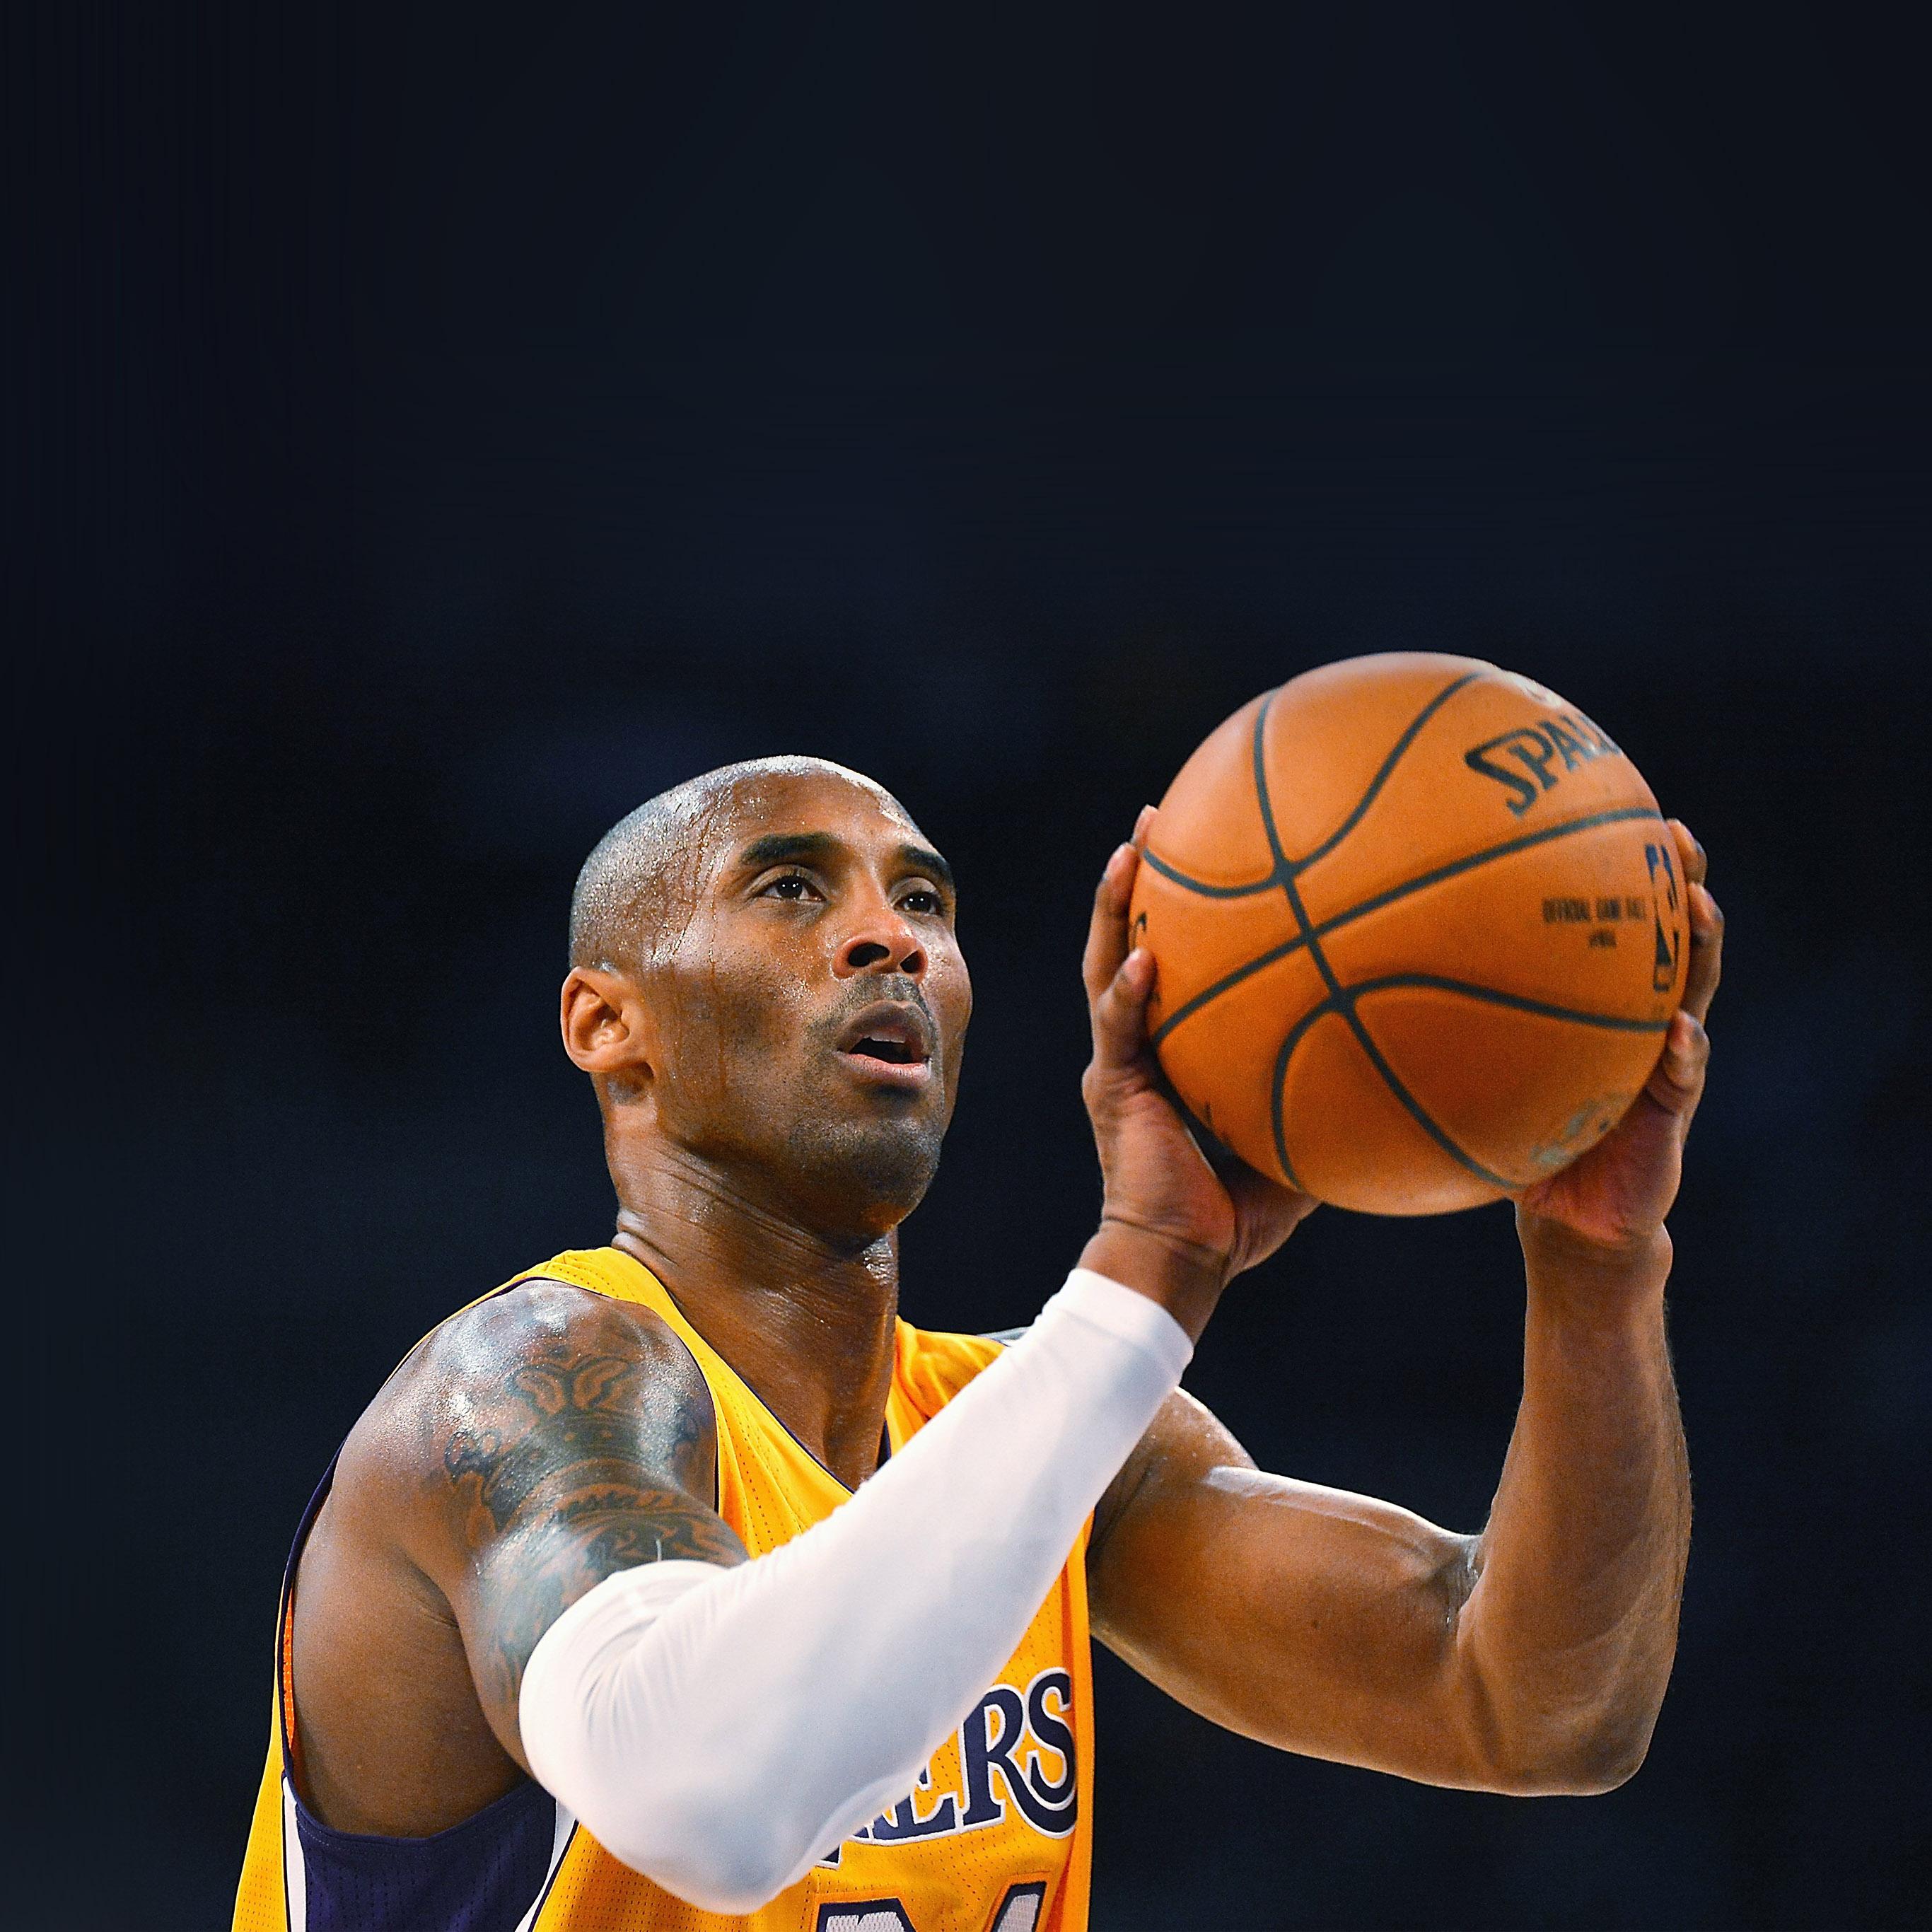 Hi38 Kobe Bryant Master Nba Sports Shoot Wallpaper